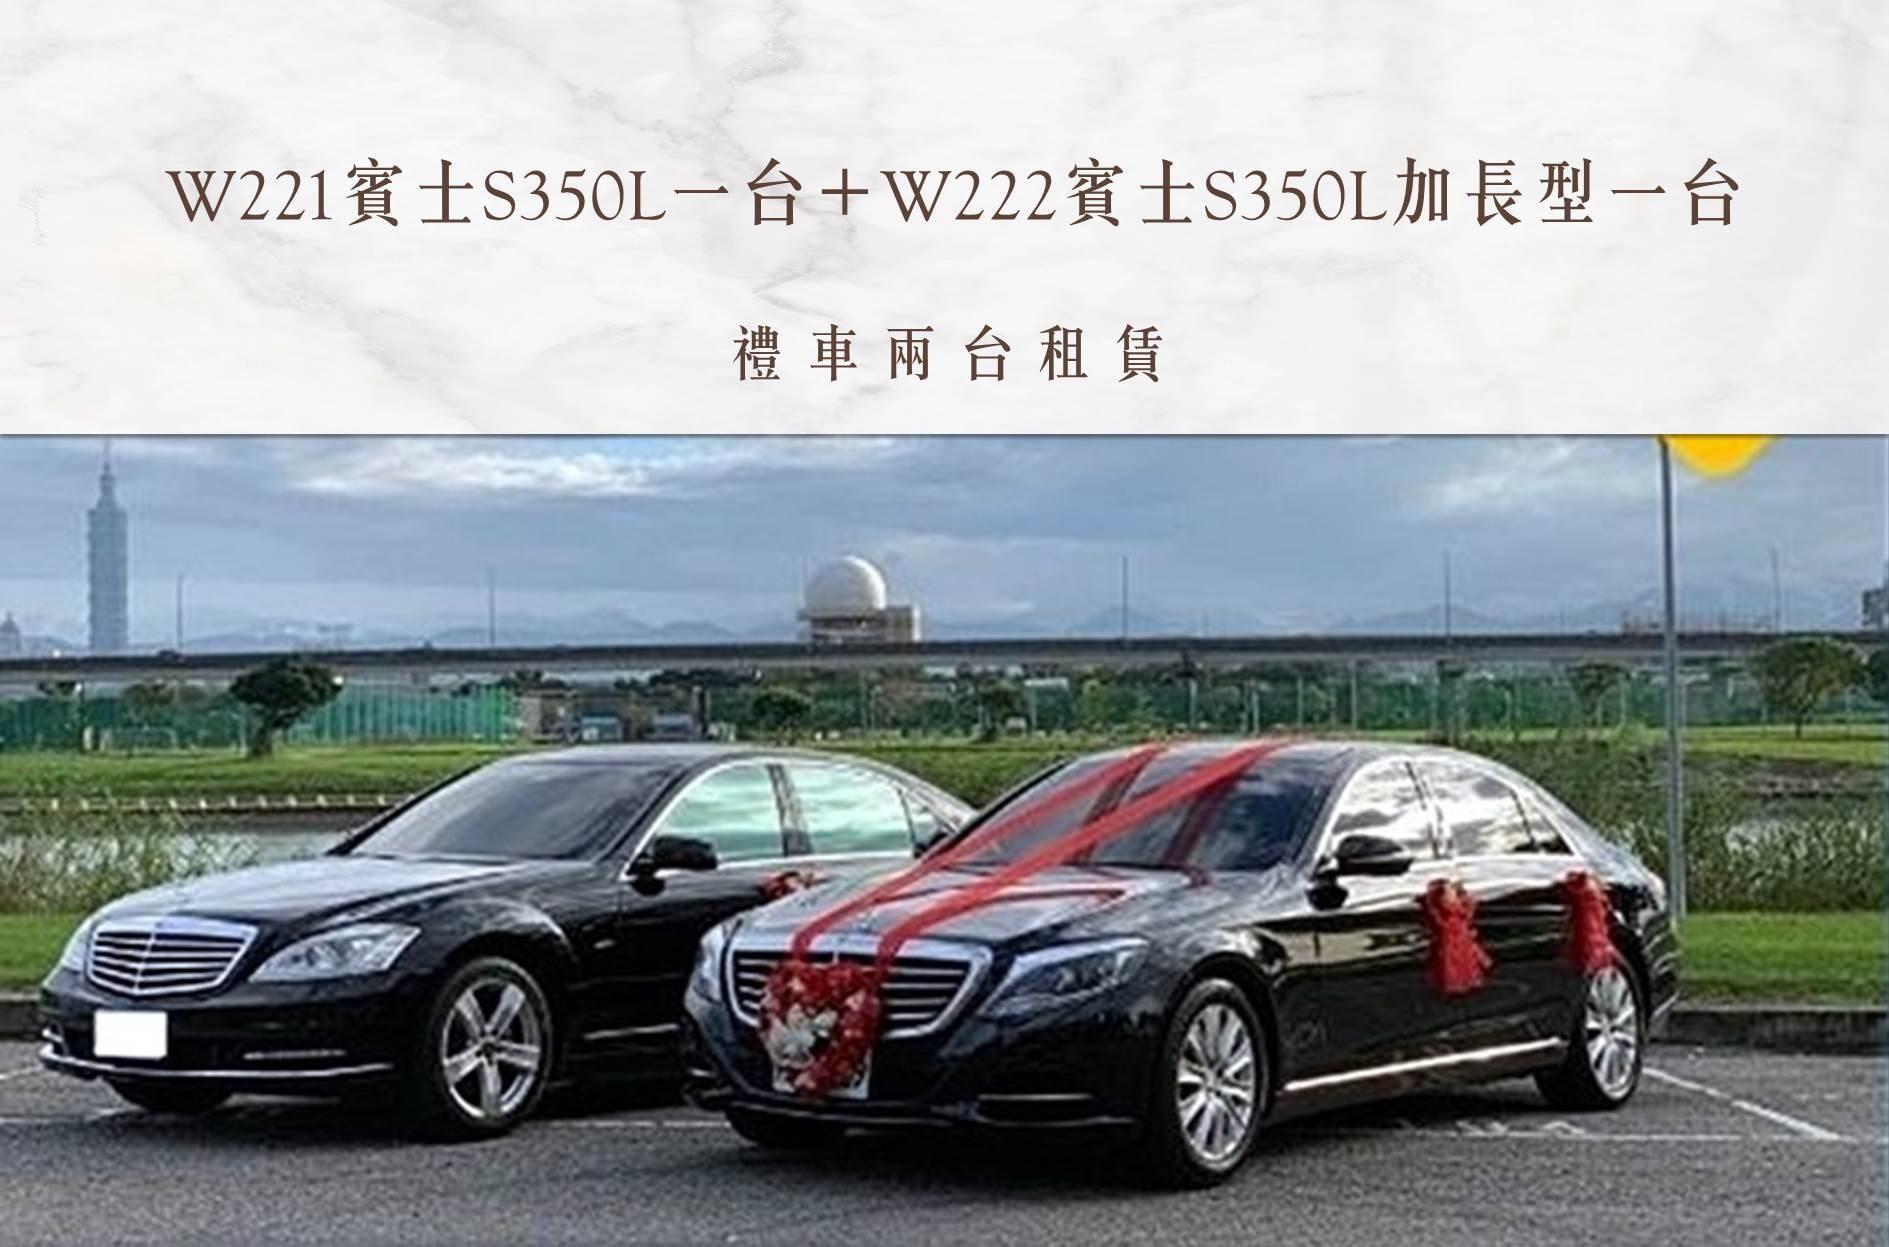 W221賓士S350L一台+W222賓士S350L加長型一台